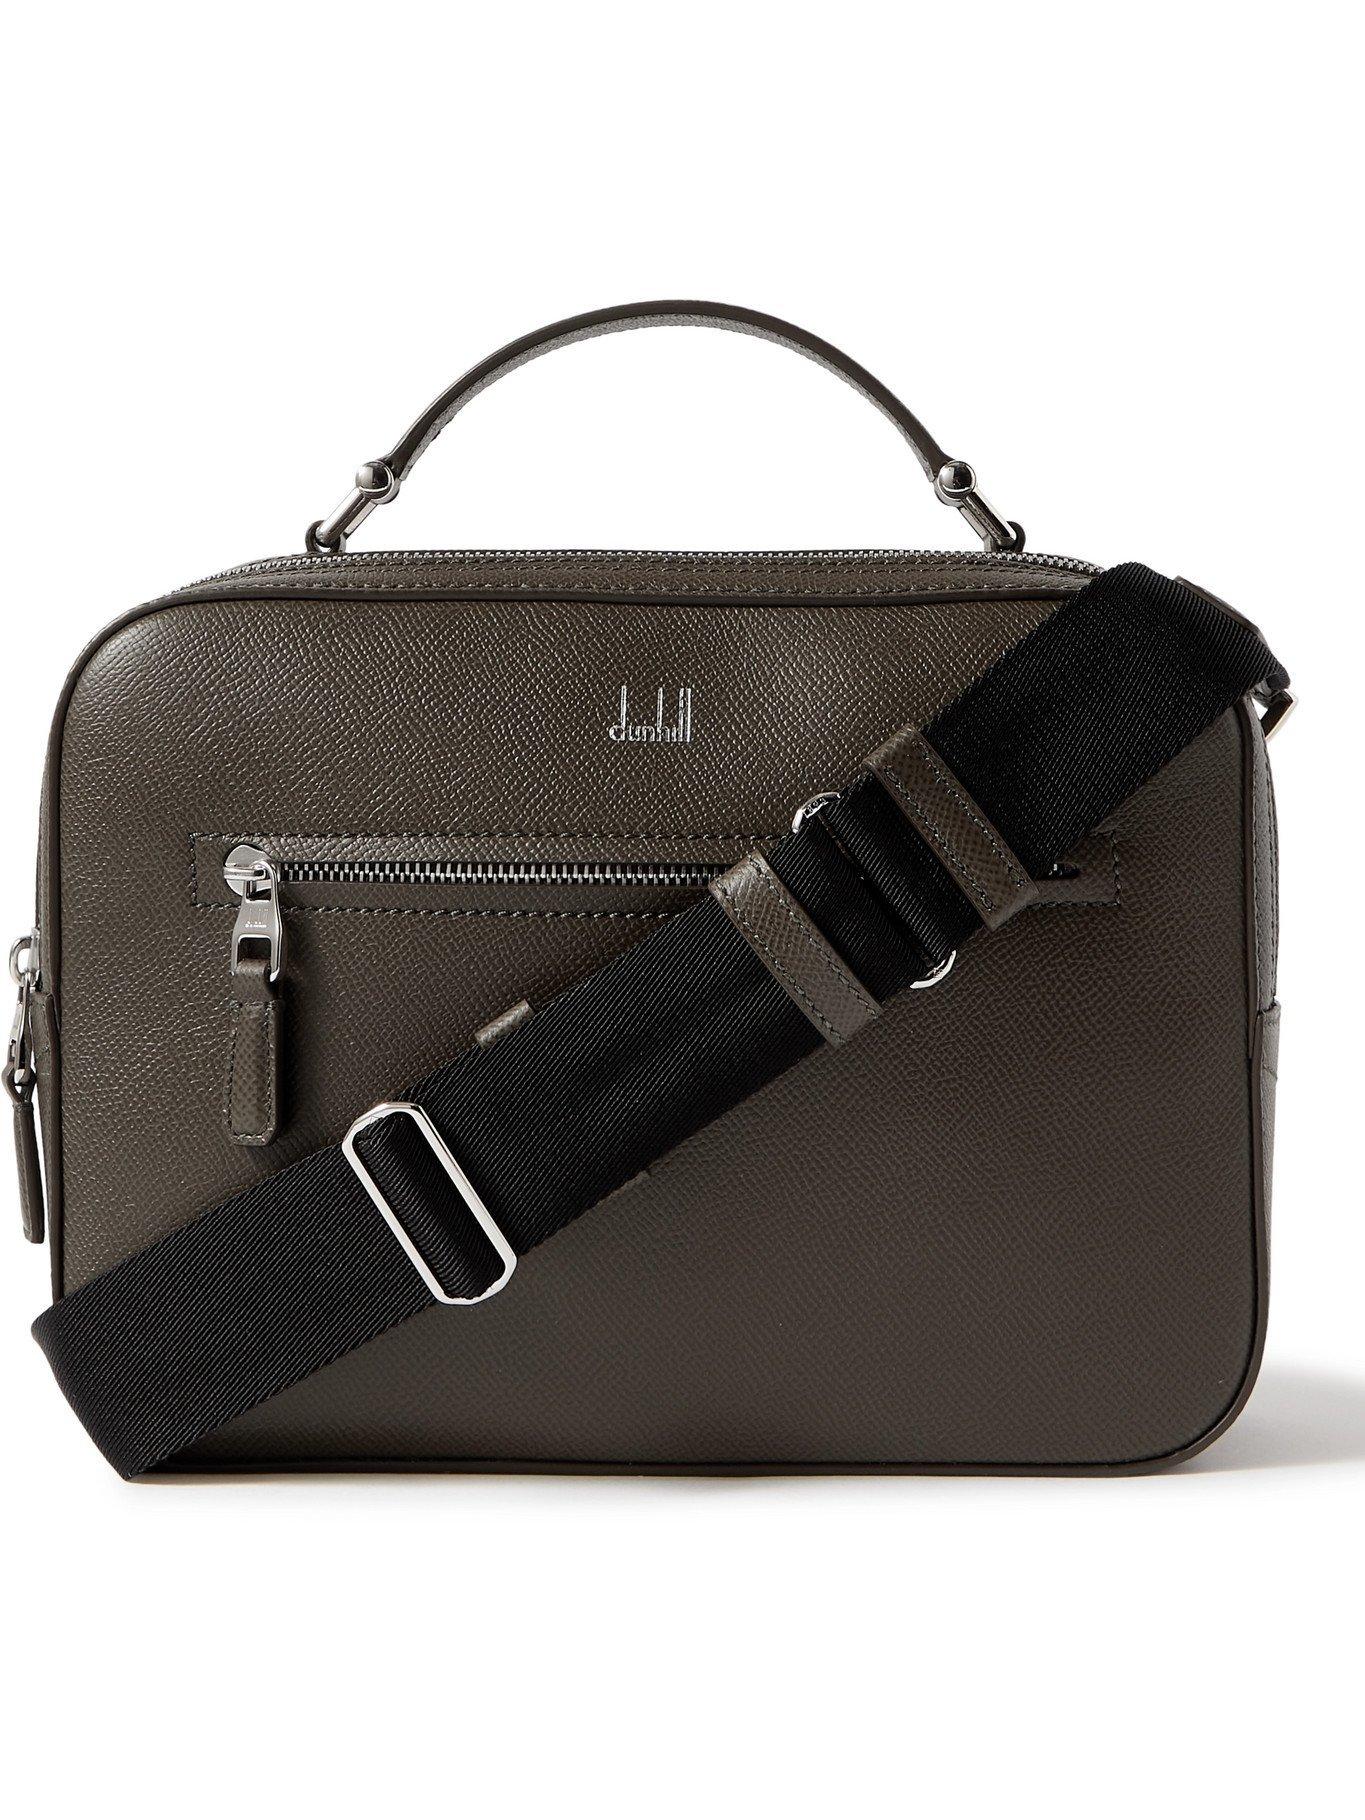 DUNHILL - Cadogan Full-Grain Leather Messenger Bag - Green